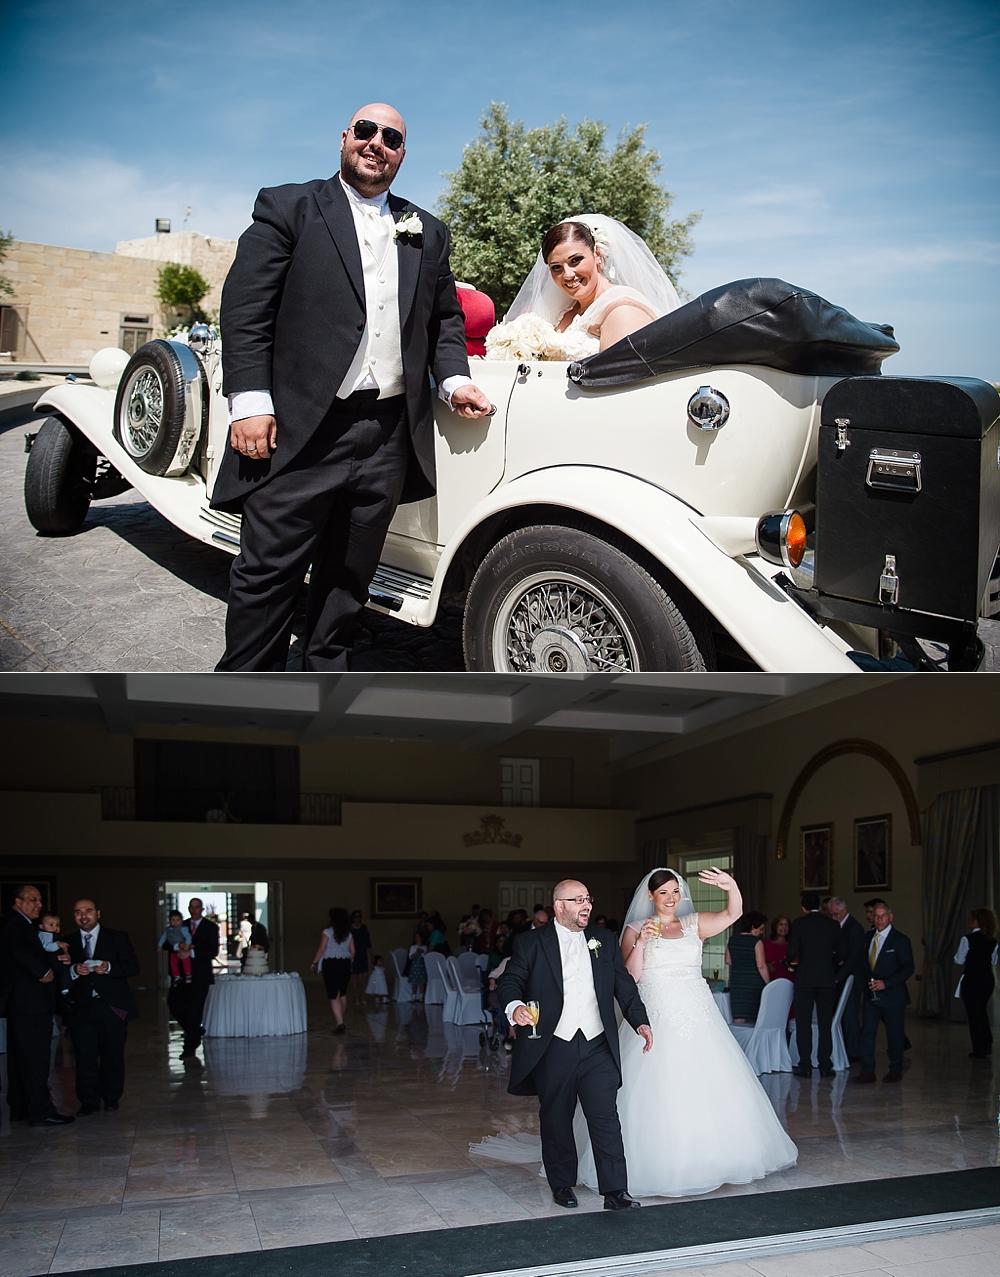 Mellieha Parish Church - Xara Lodge - Wedding Photography Malta